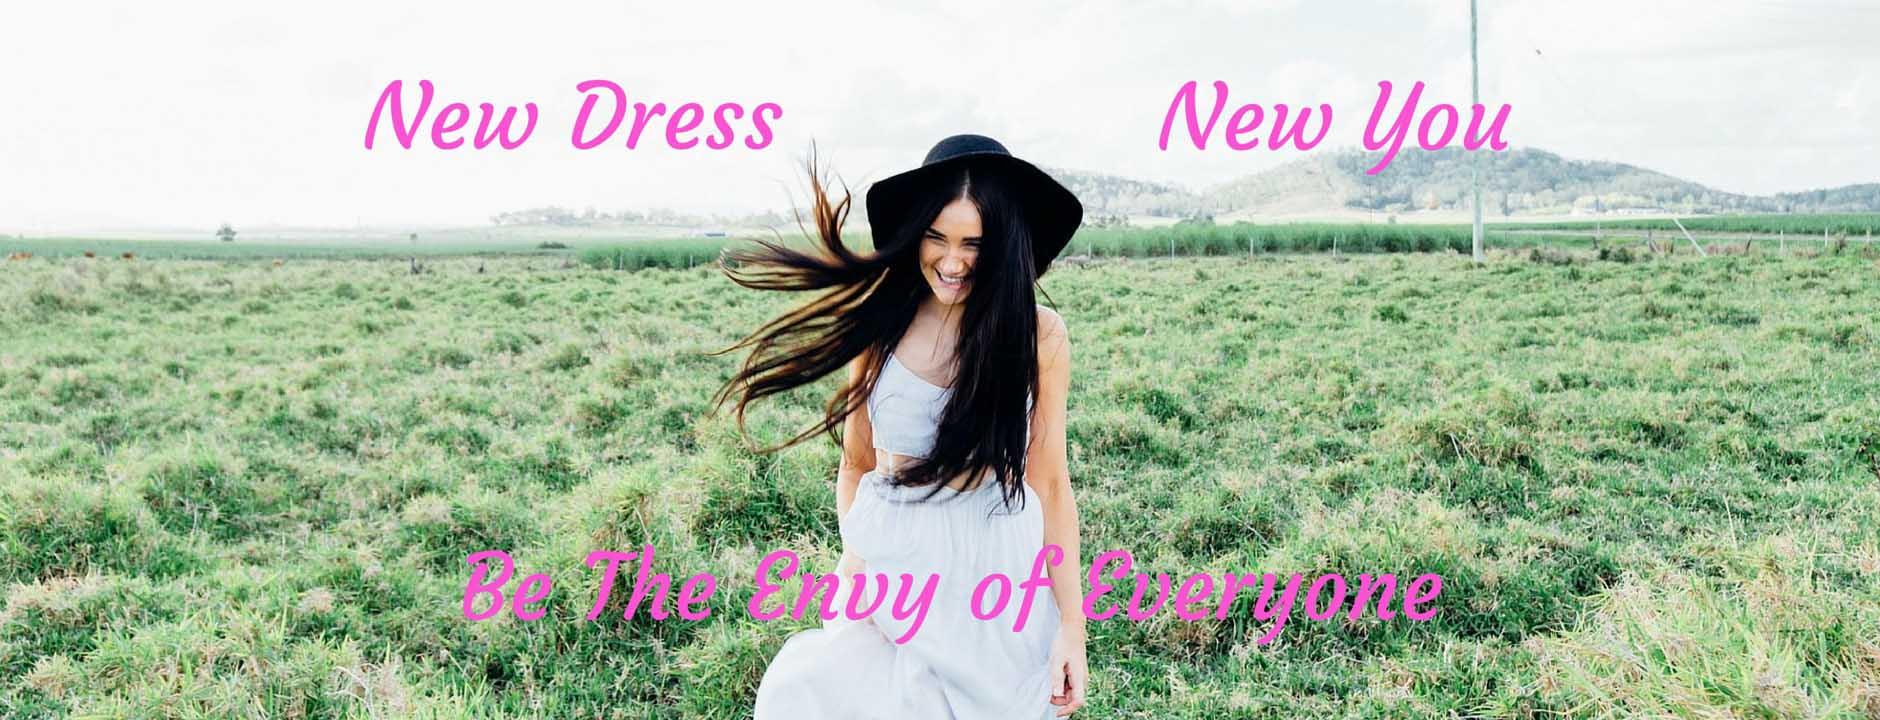 Maxi Dresses, Bodycon Dresses, Sheath Dresses, Shift Dresses and Skater Dresses